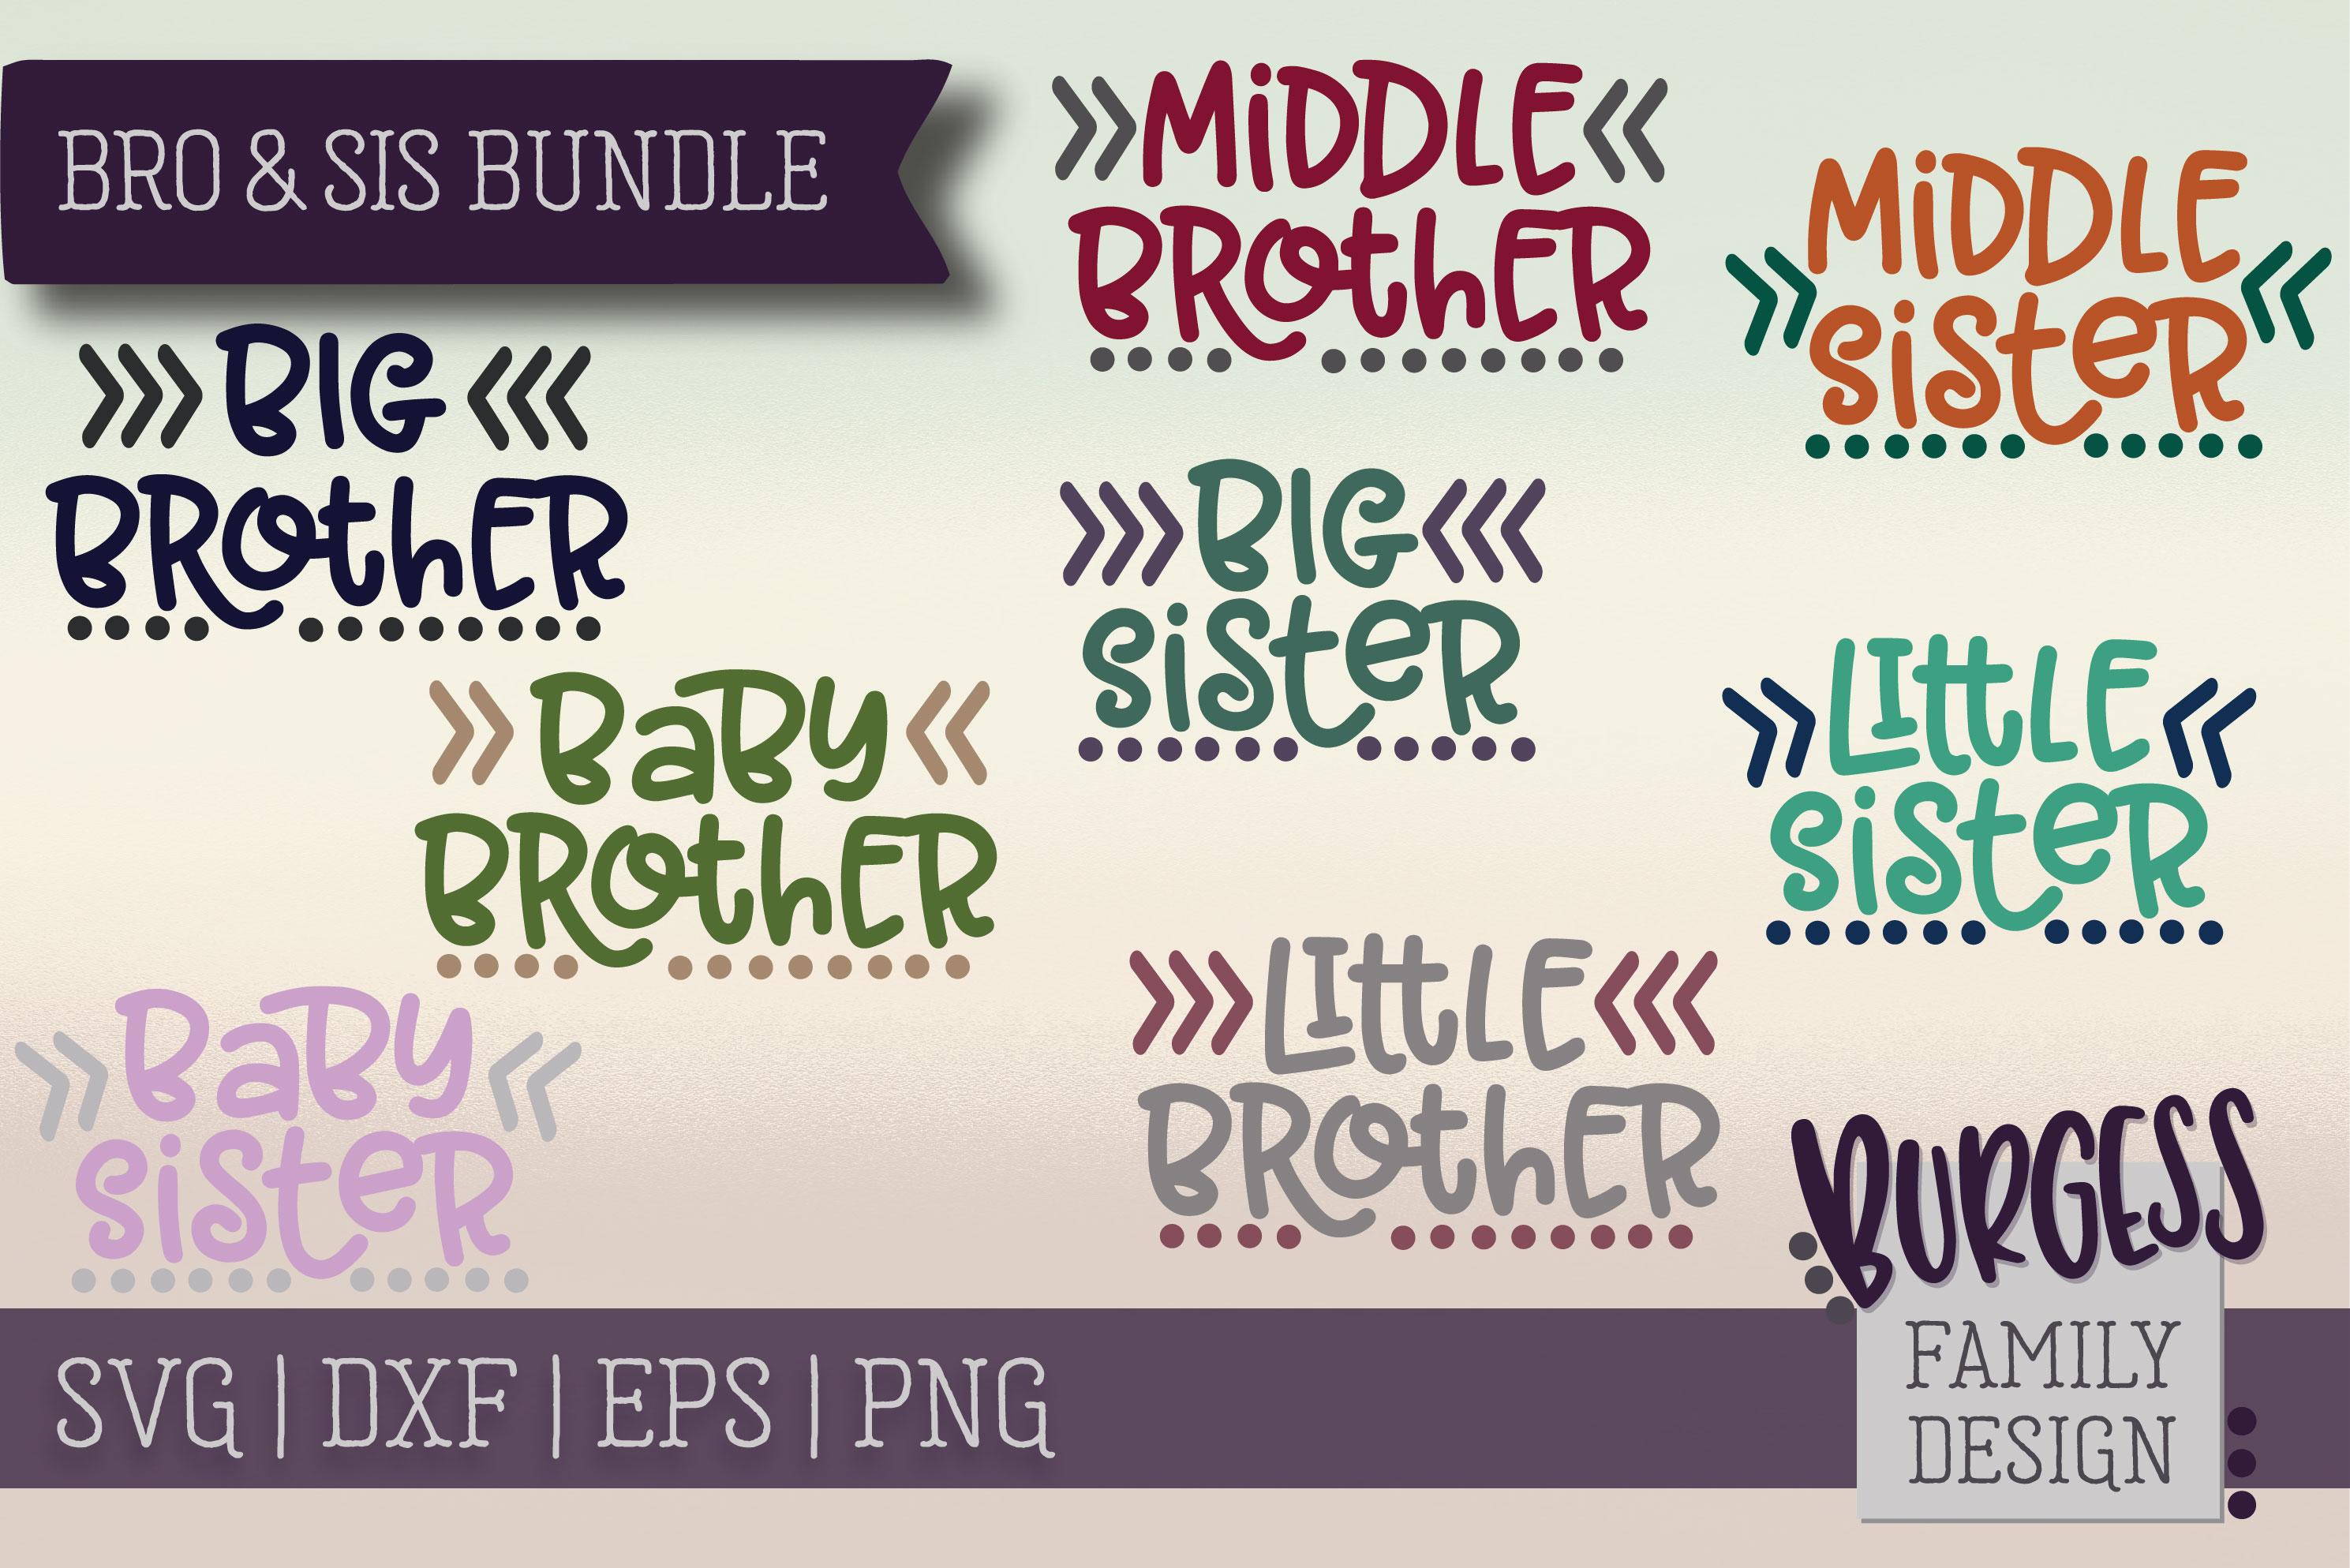 The starter bundle - Over 200 Designs | SVG DXF EPS PNG example image 2